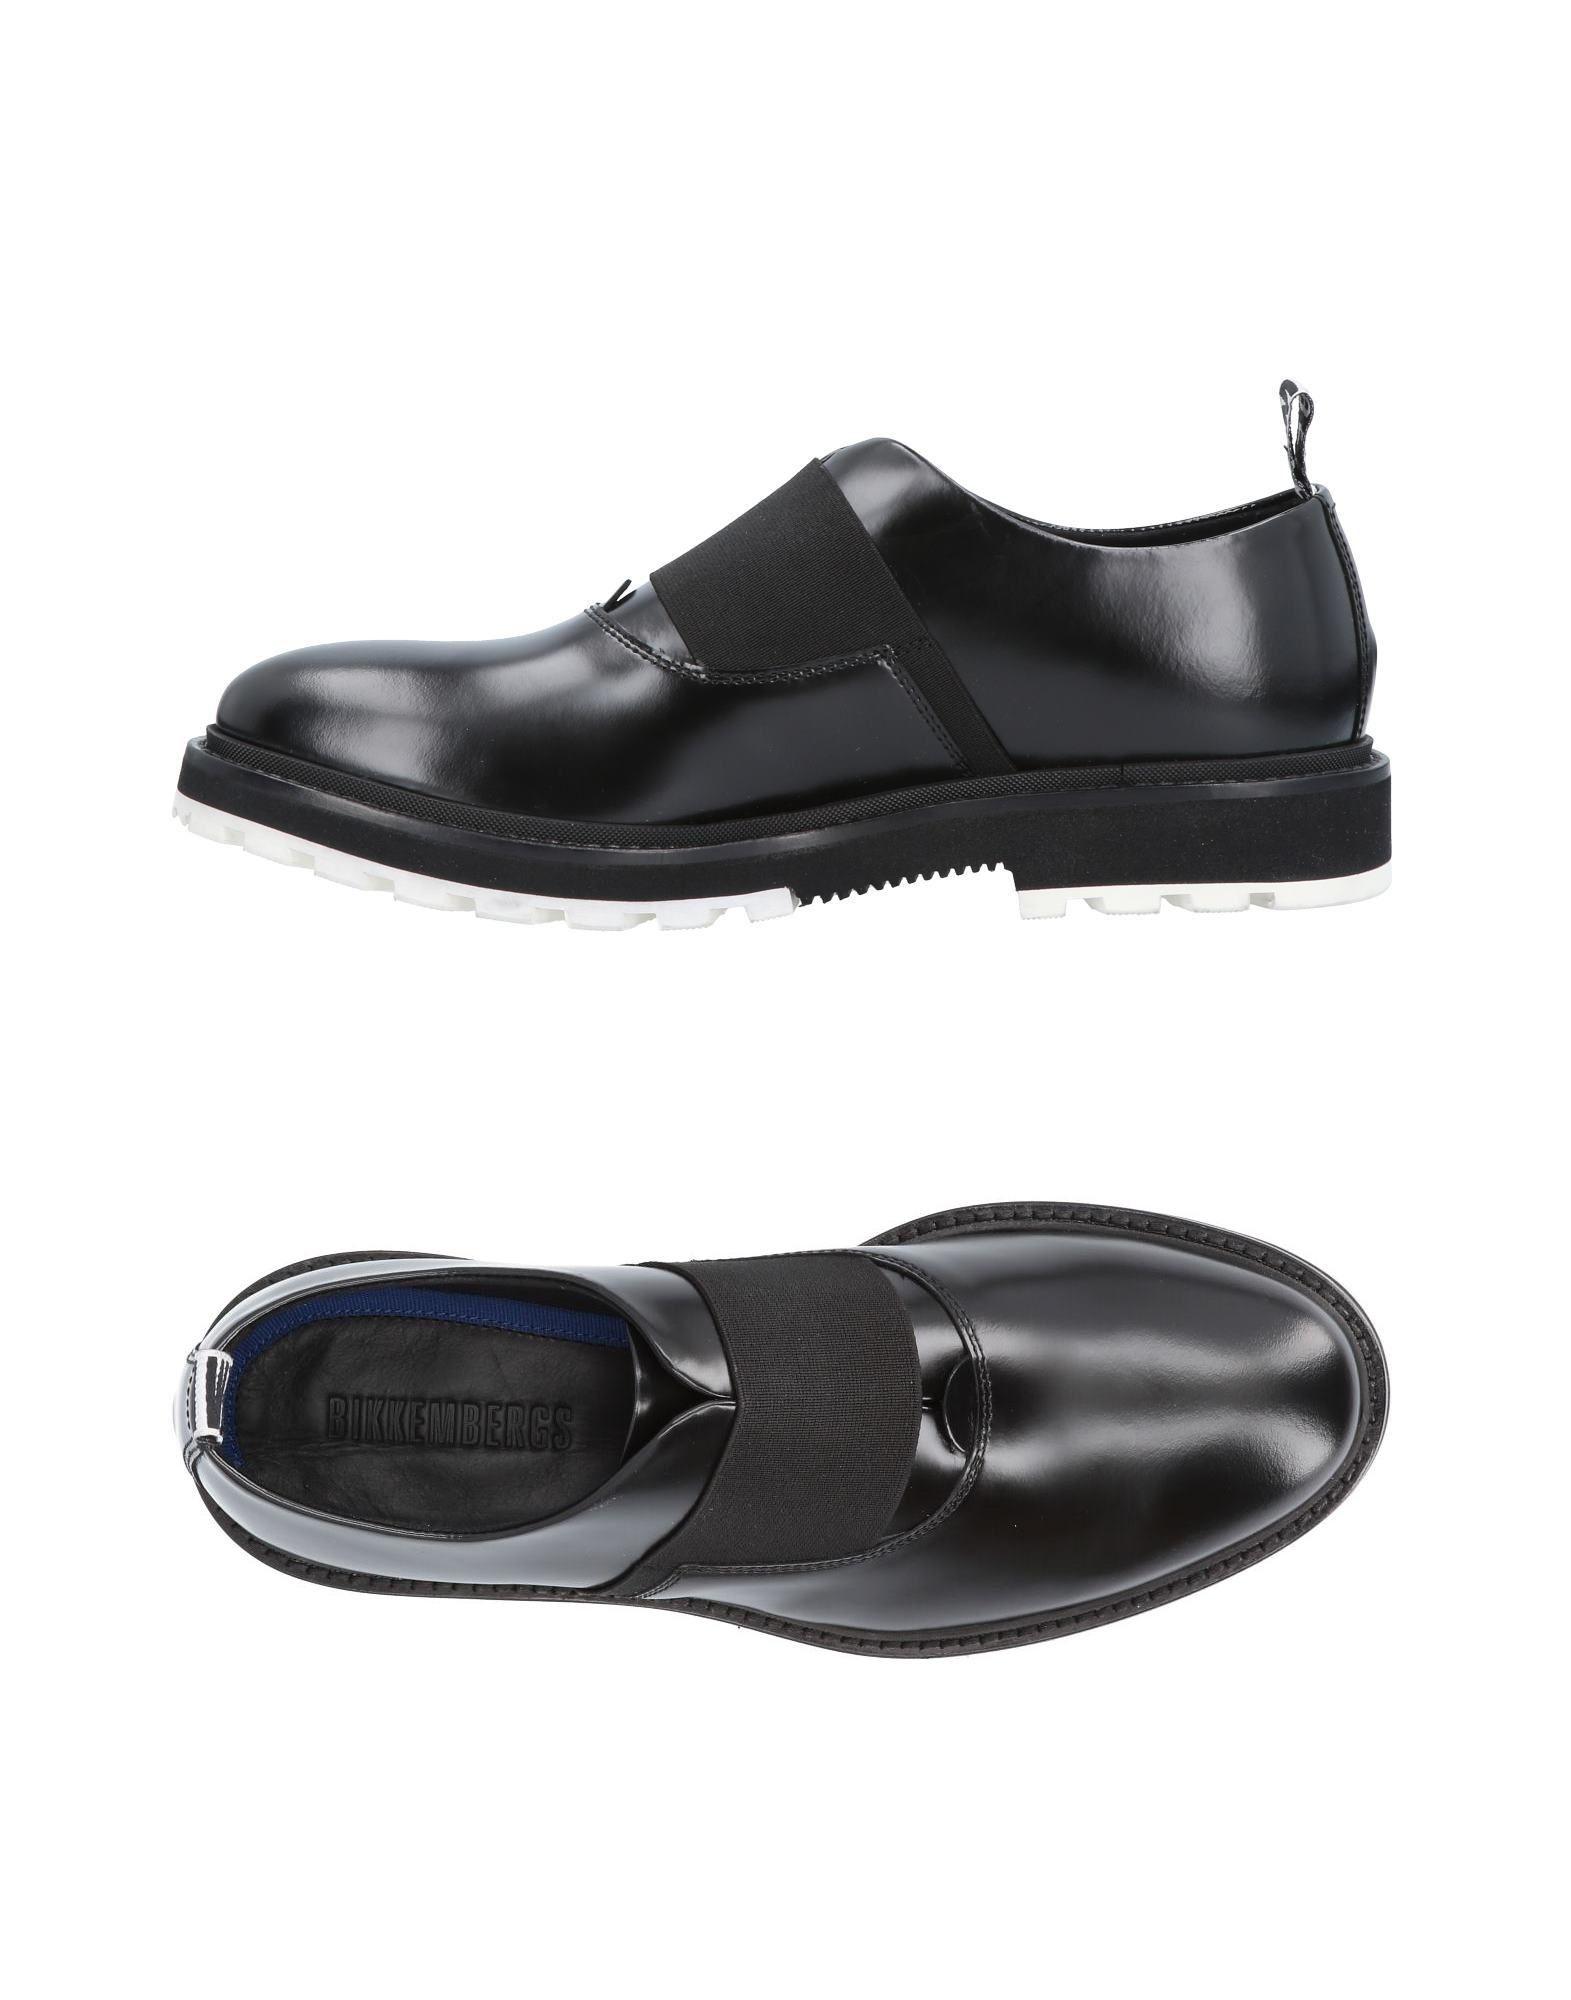 Bikkembergs Mokassins Herren  11449922IL Gute Qualität beliebte Schuhe